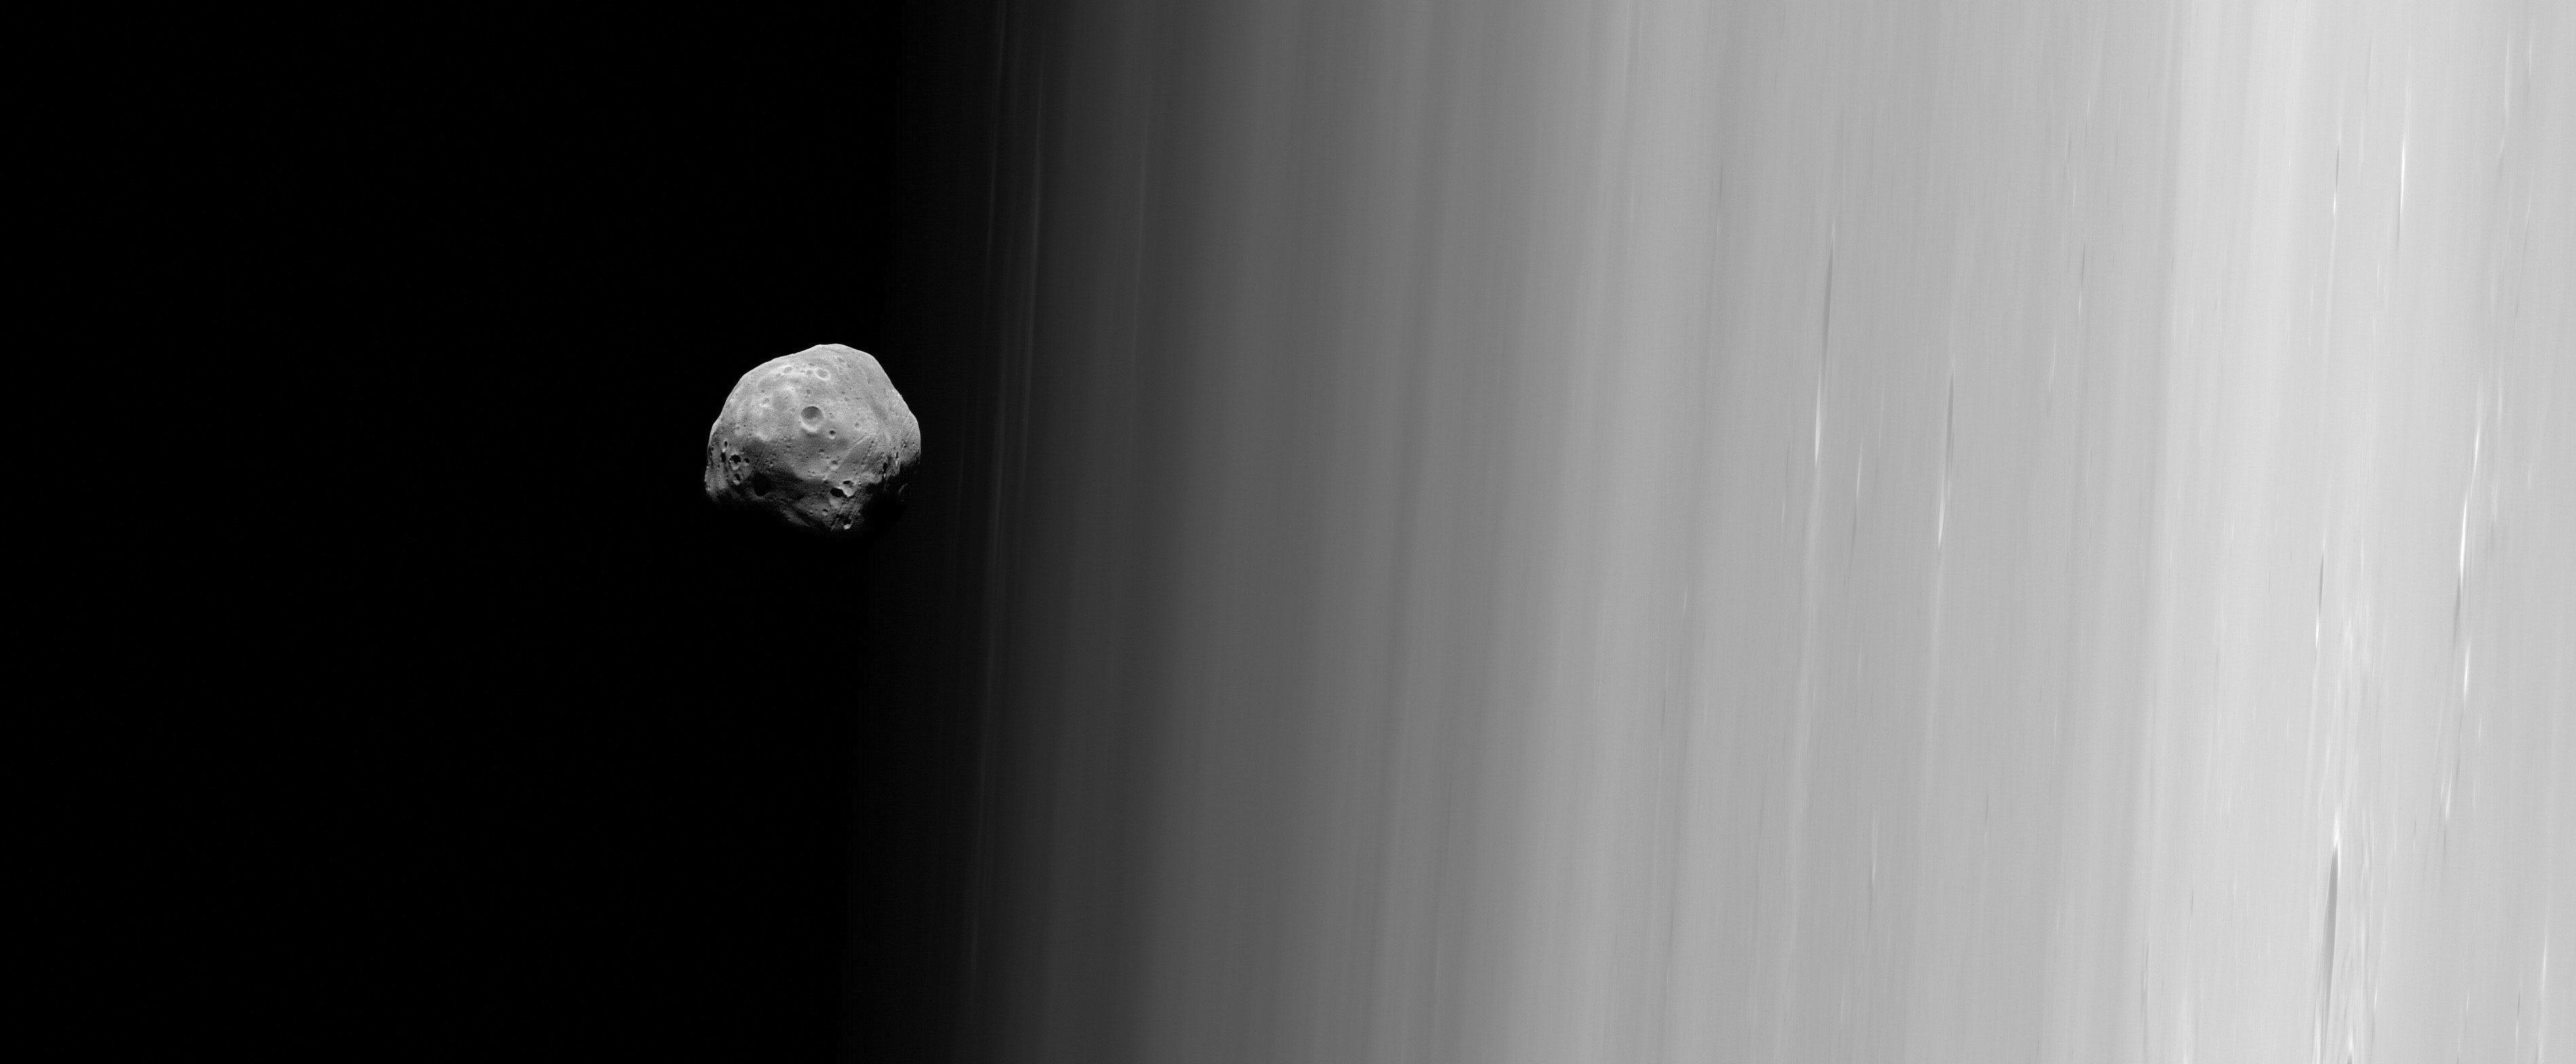 Phobos from Mars Express (ESA)